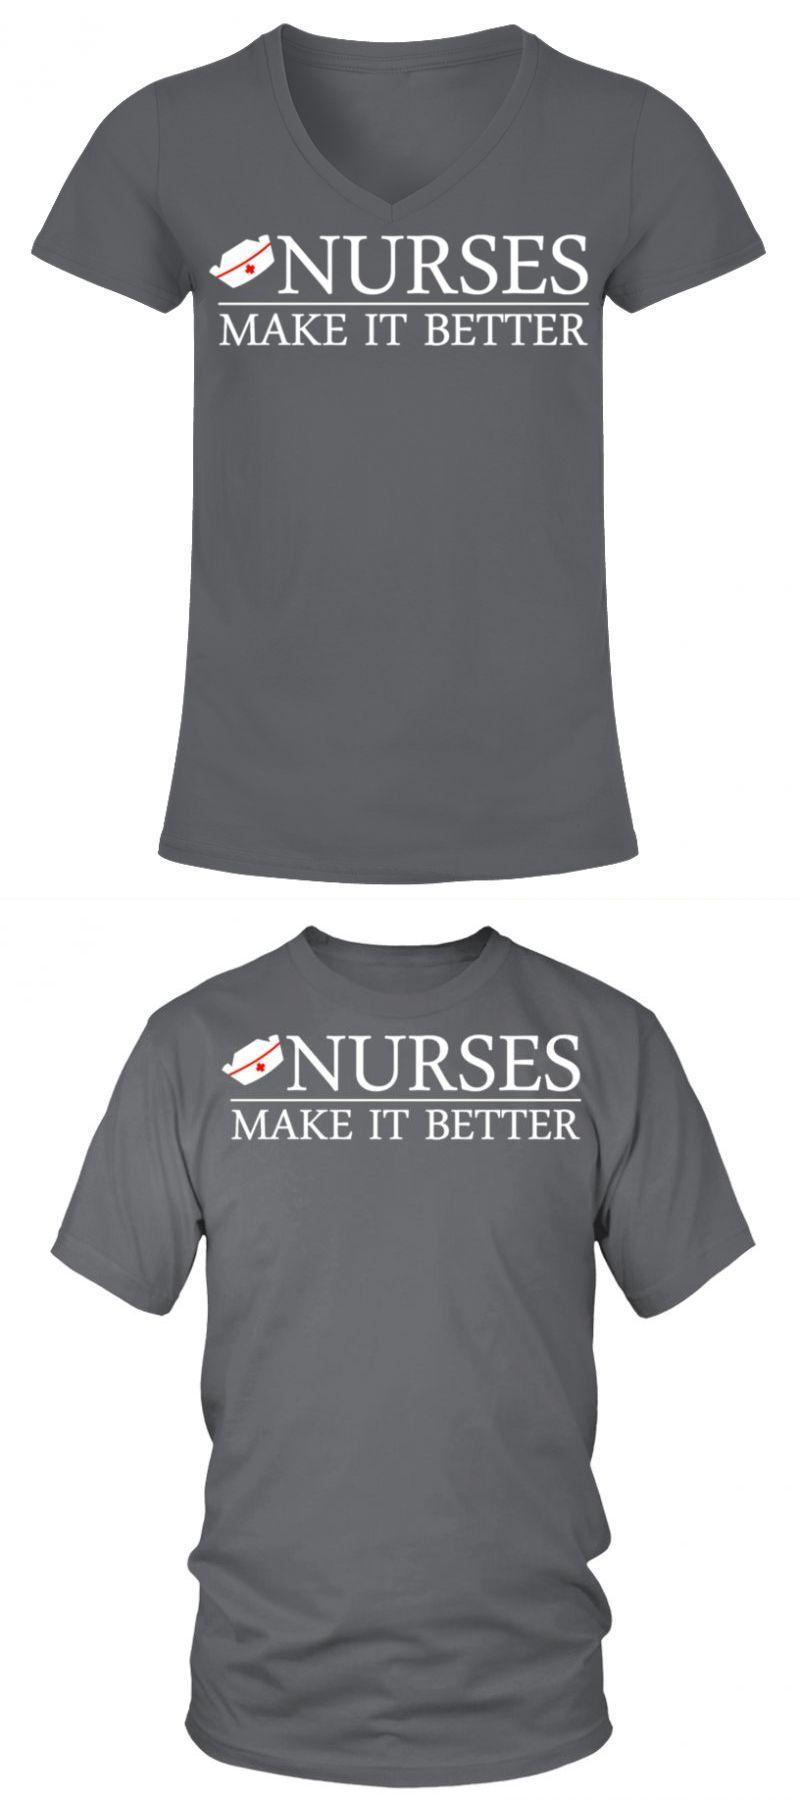 best service 7f71c 9f448 Uncle drew t shirt celtics nurses make it better tshirt t ...